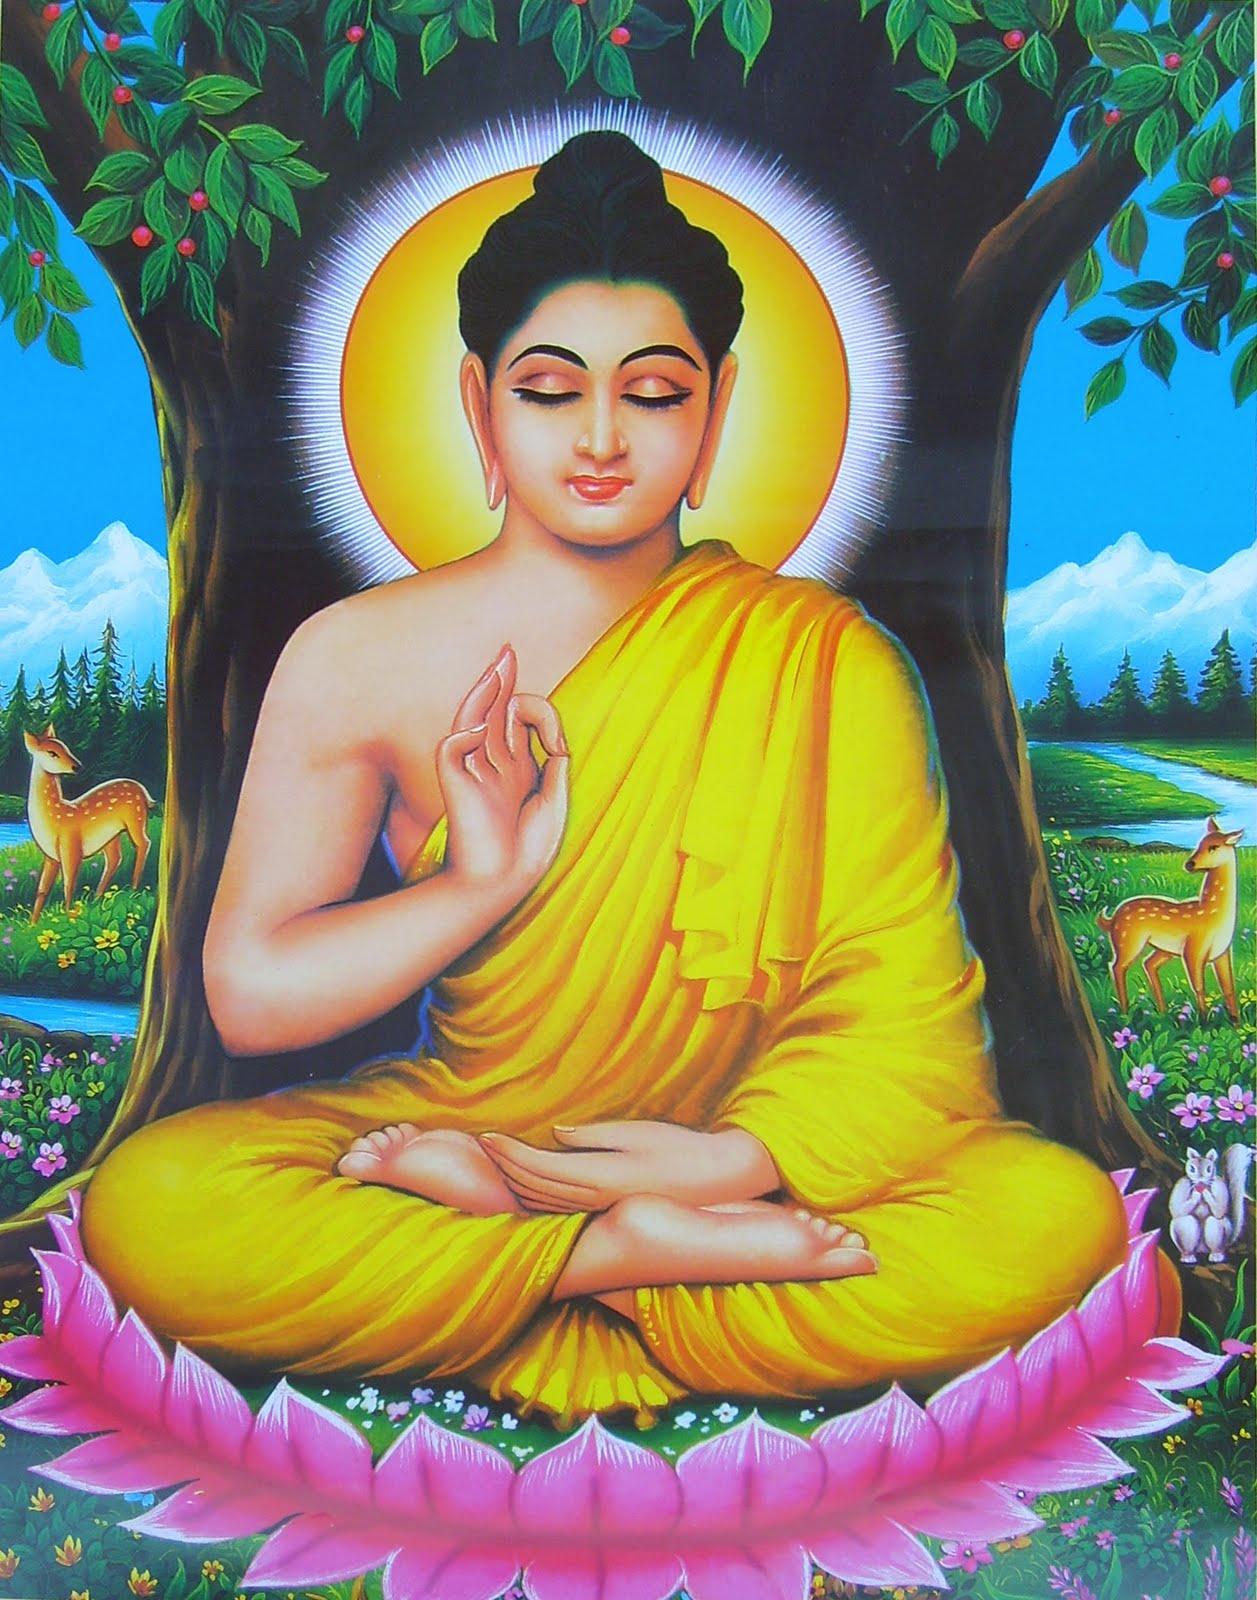 Comparison of Socrates and Siddhartha Guatama Buddha